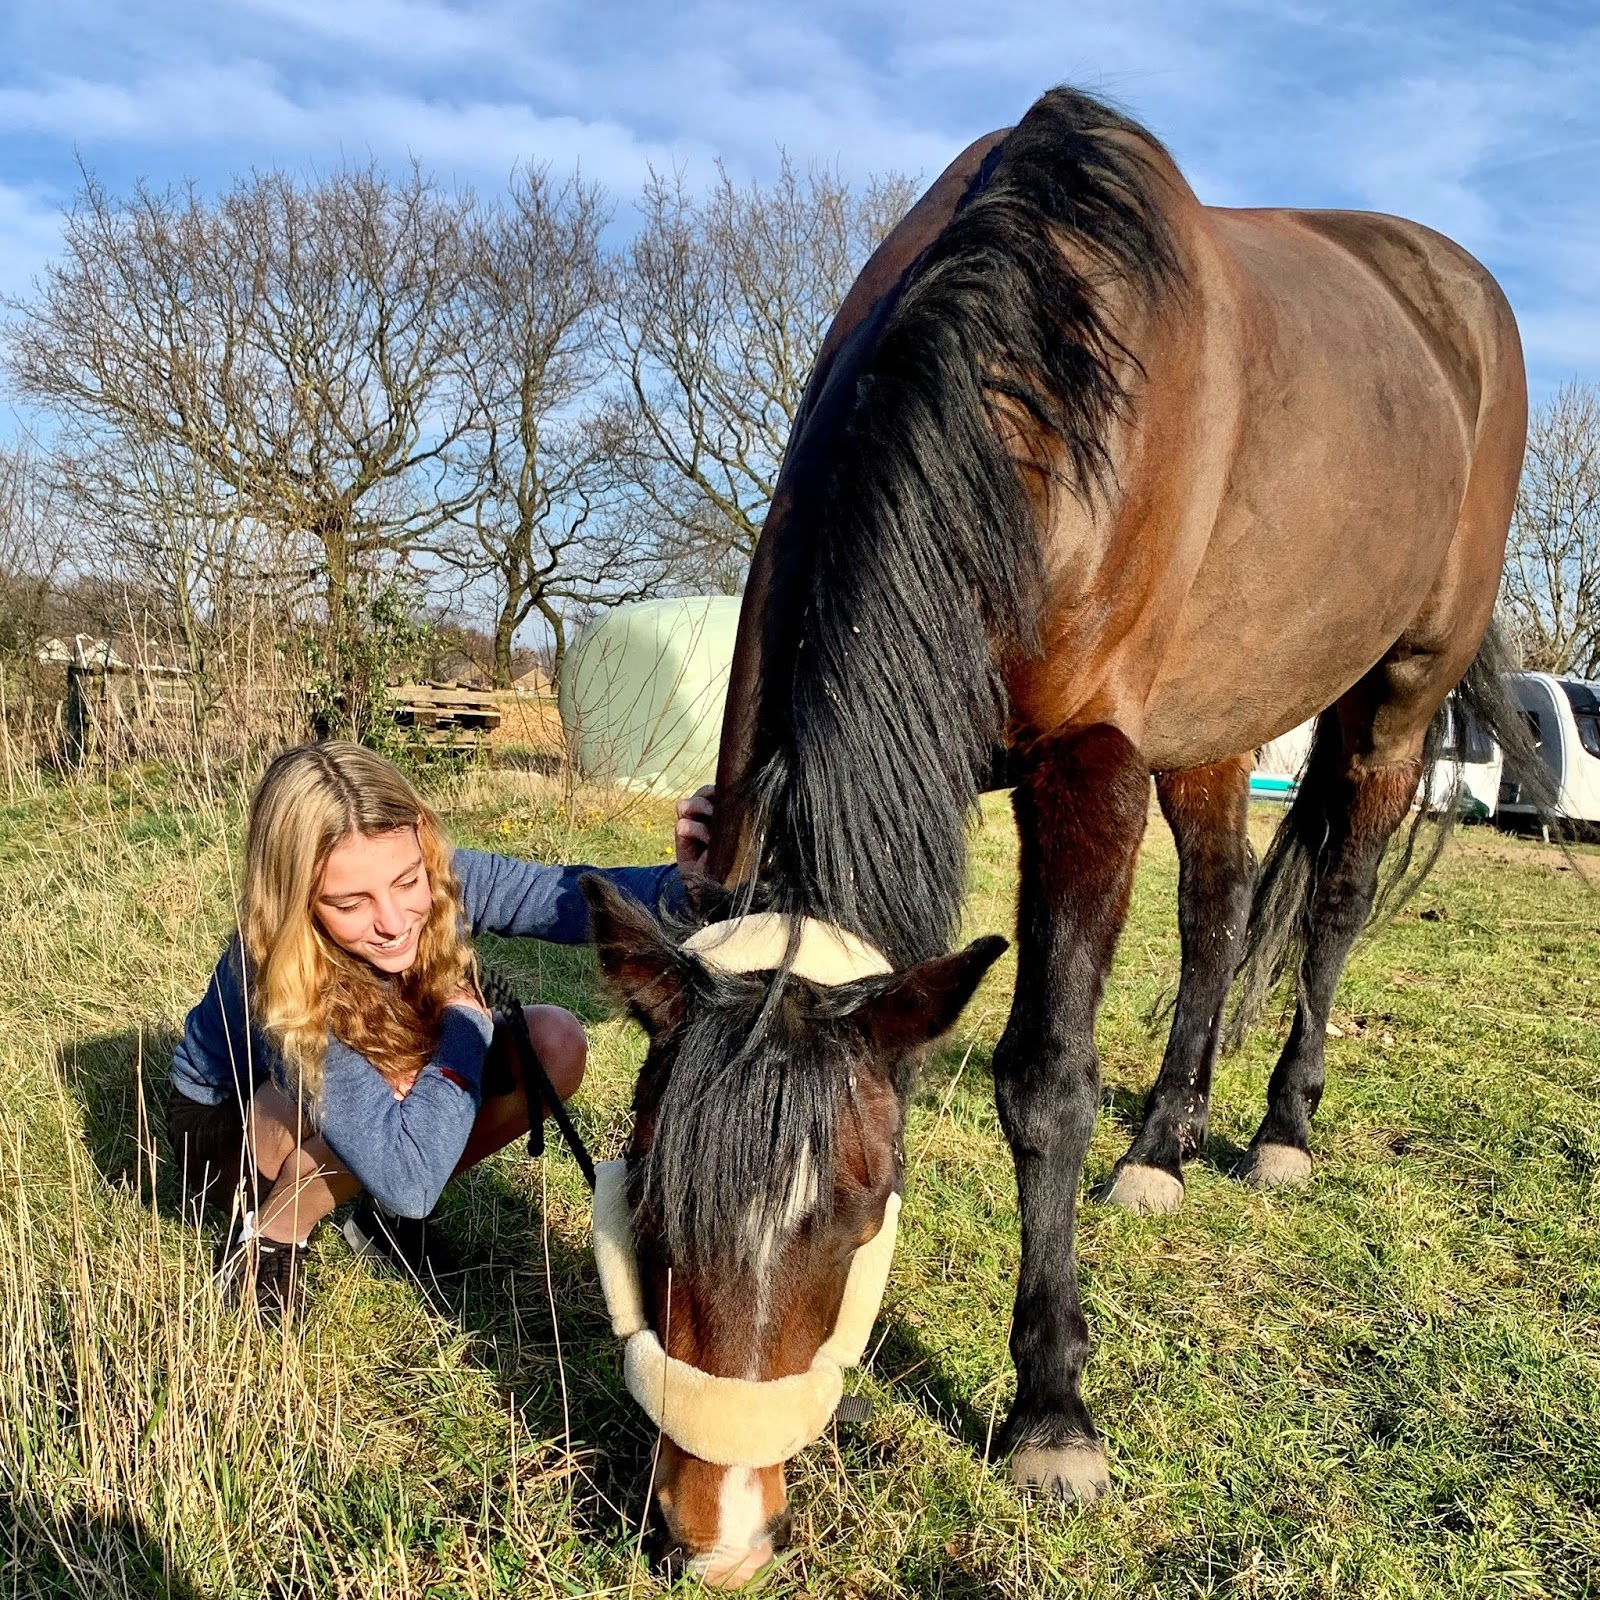 equestrian; love horses; girl